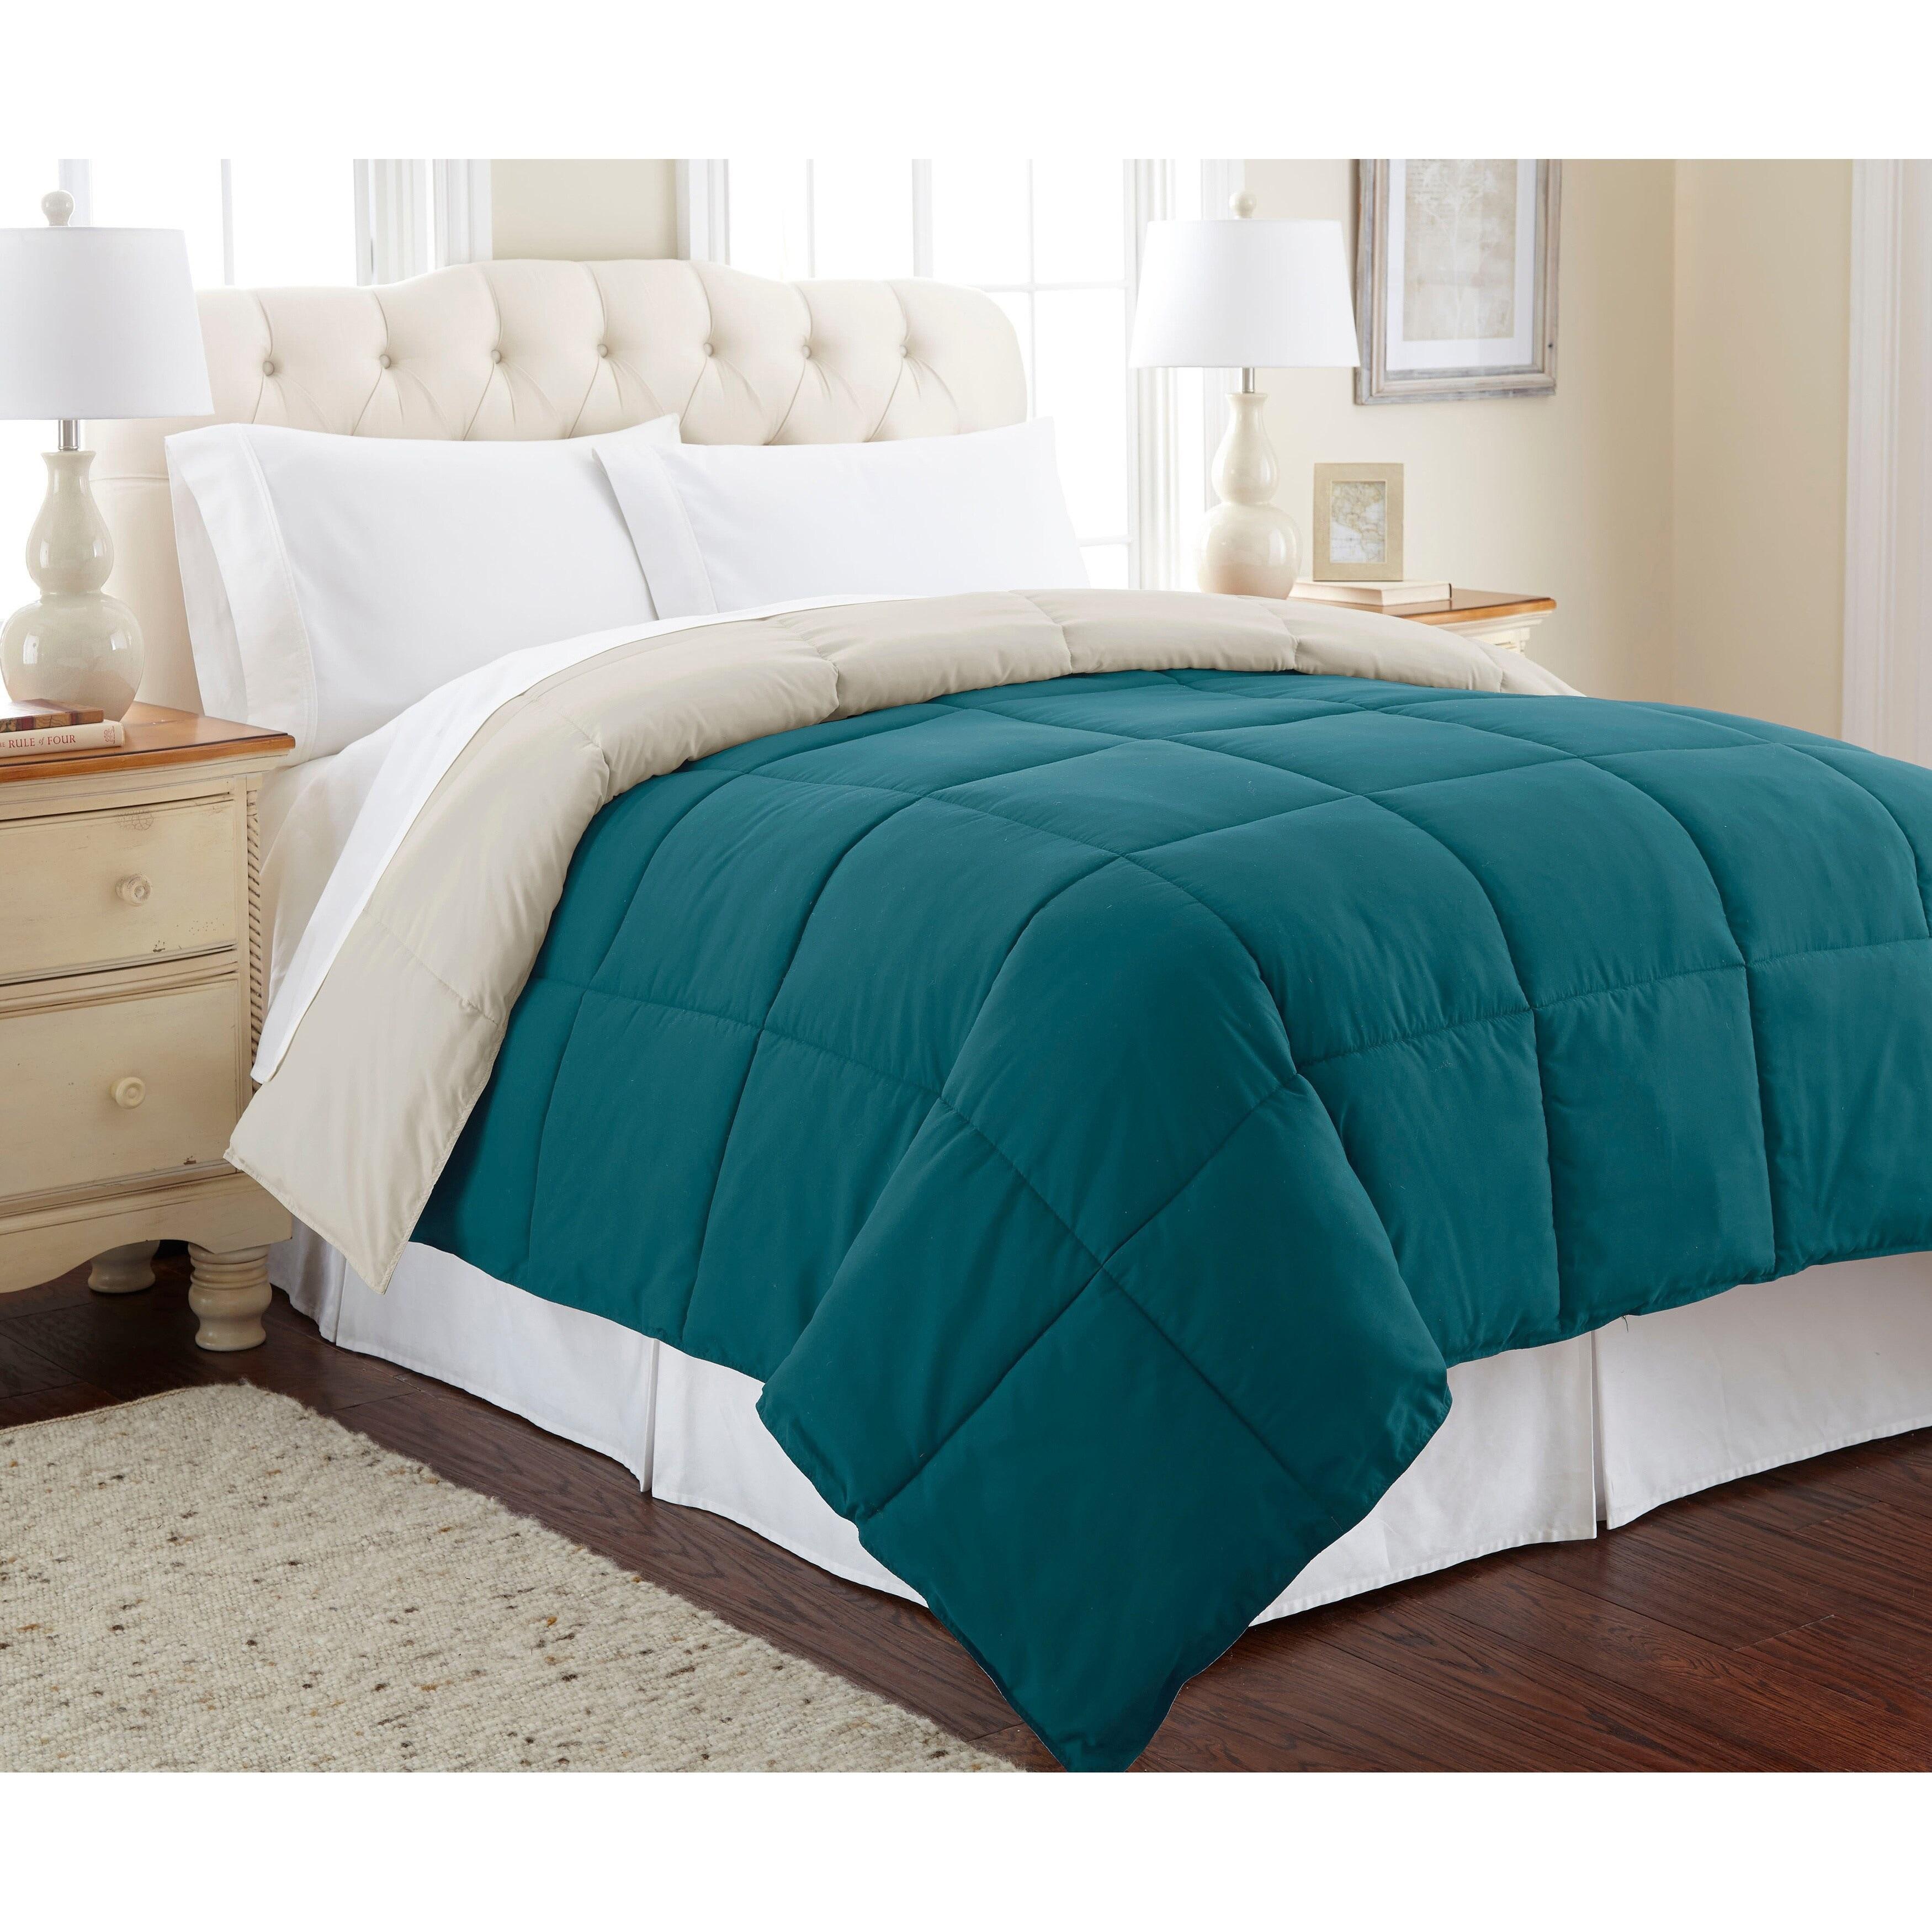 Full//Queen, Grey Devon Bedding Collection Modern Reversible Luxury Ultra Soft Comforter Design for Home Hotel D/écor Refinery29 All Season Premium 4 Piece Set